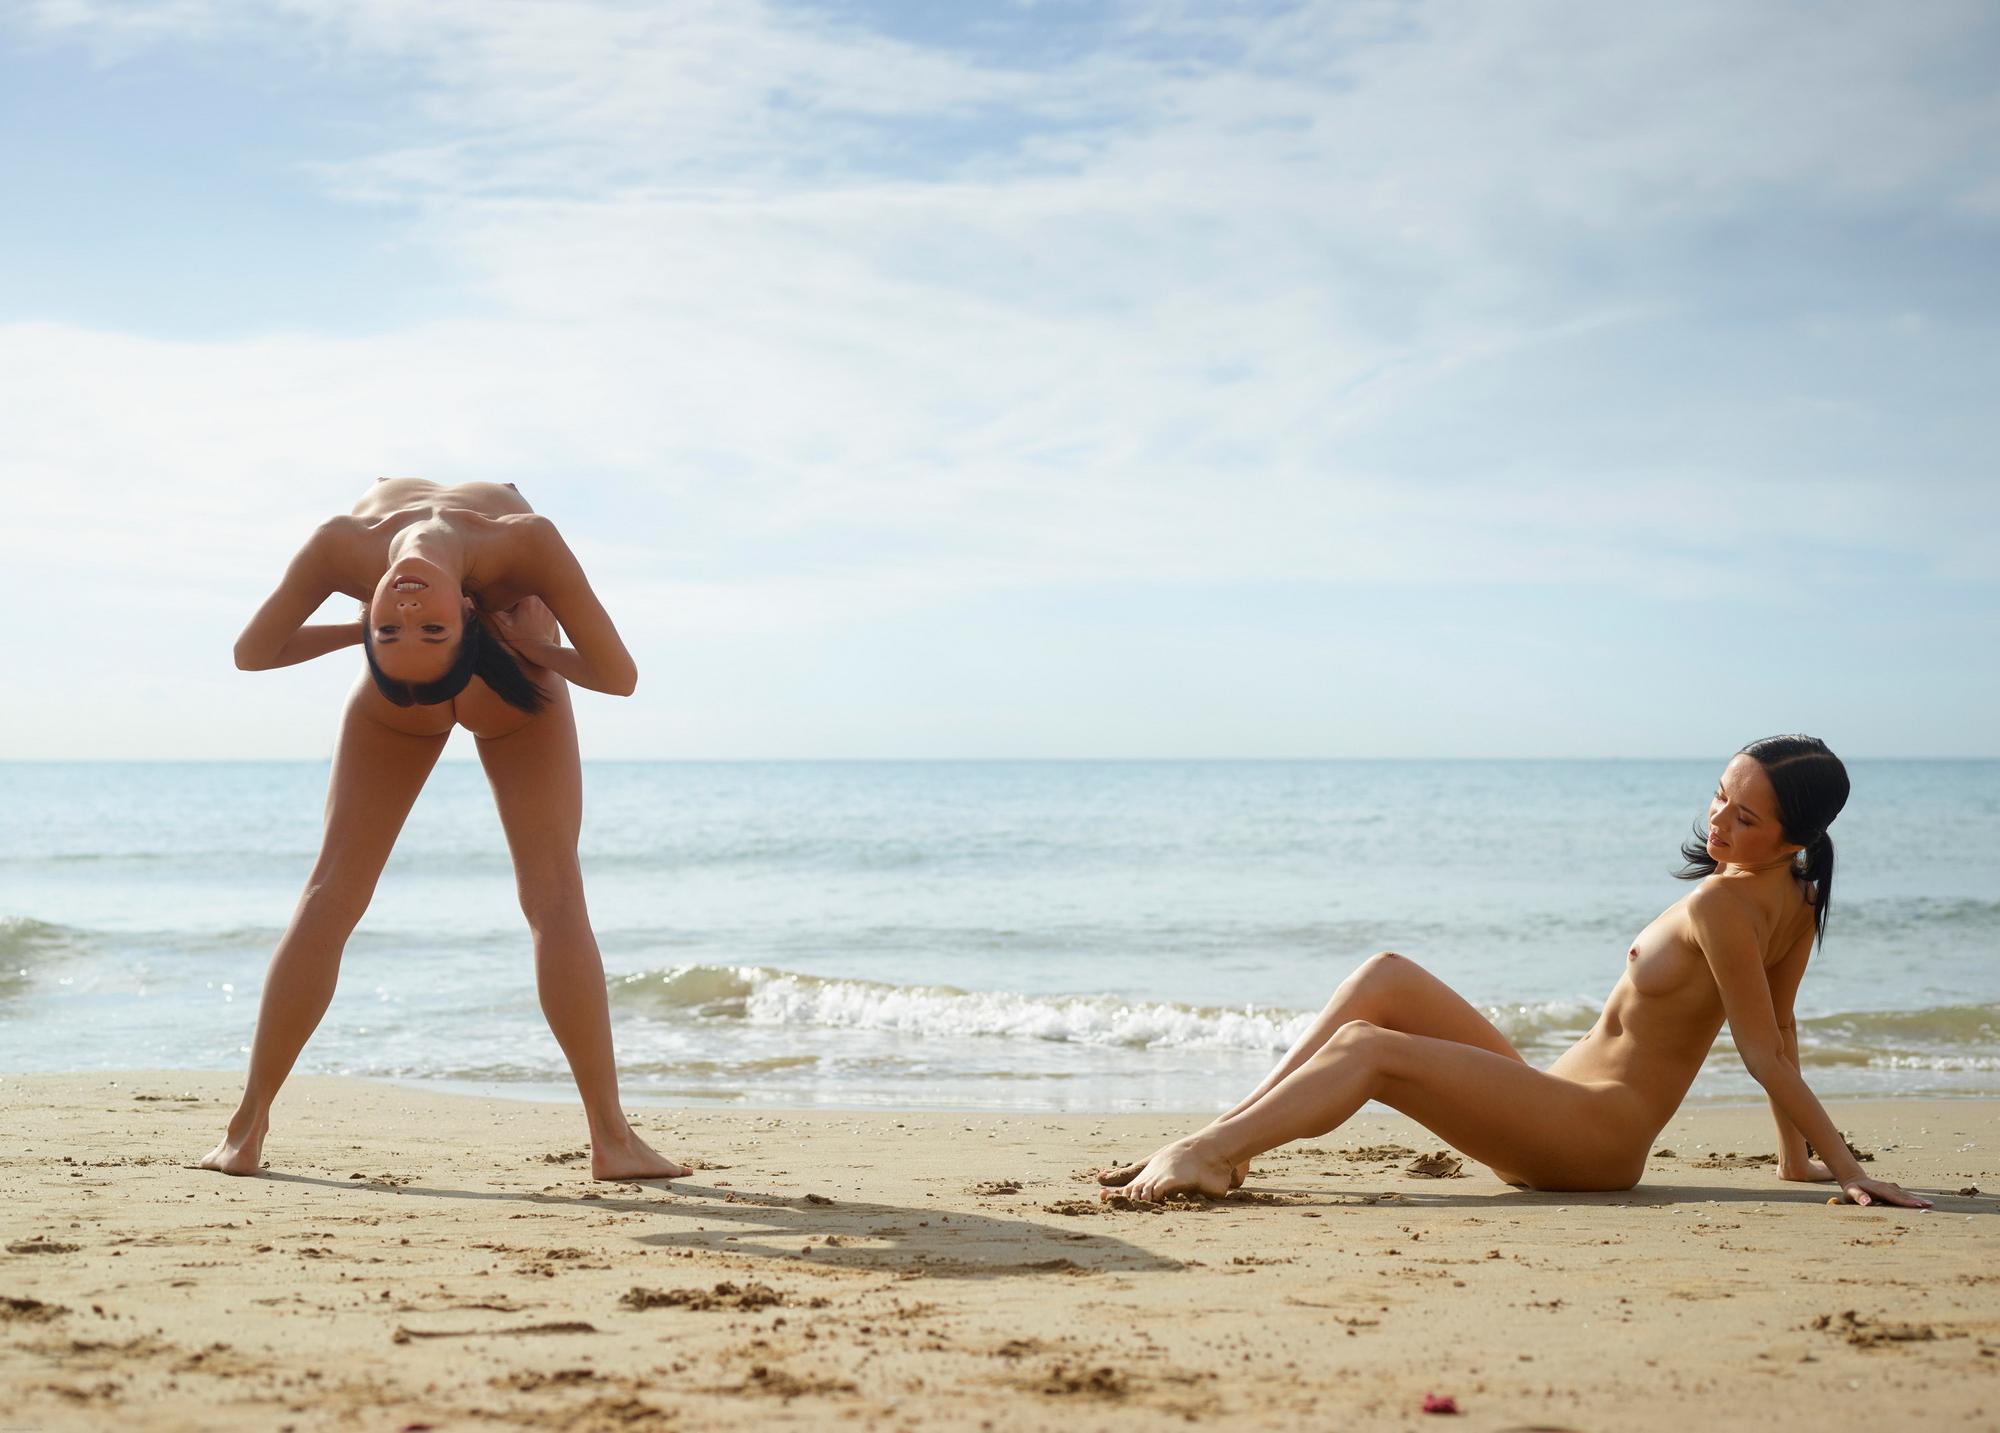 julietta-magdalena-beach-seaside-flexible-twins-hegre-art-07